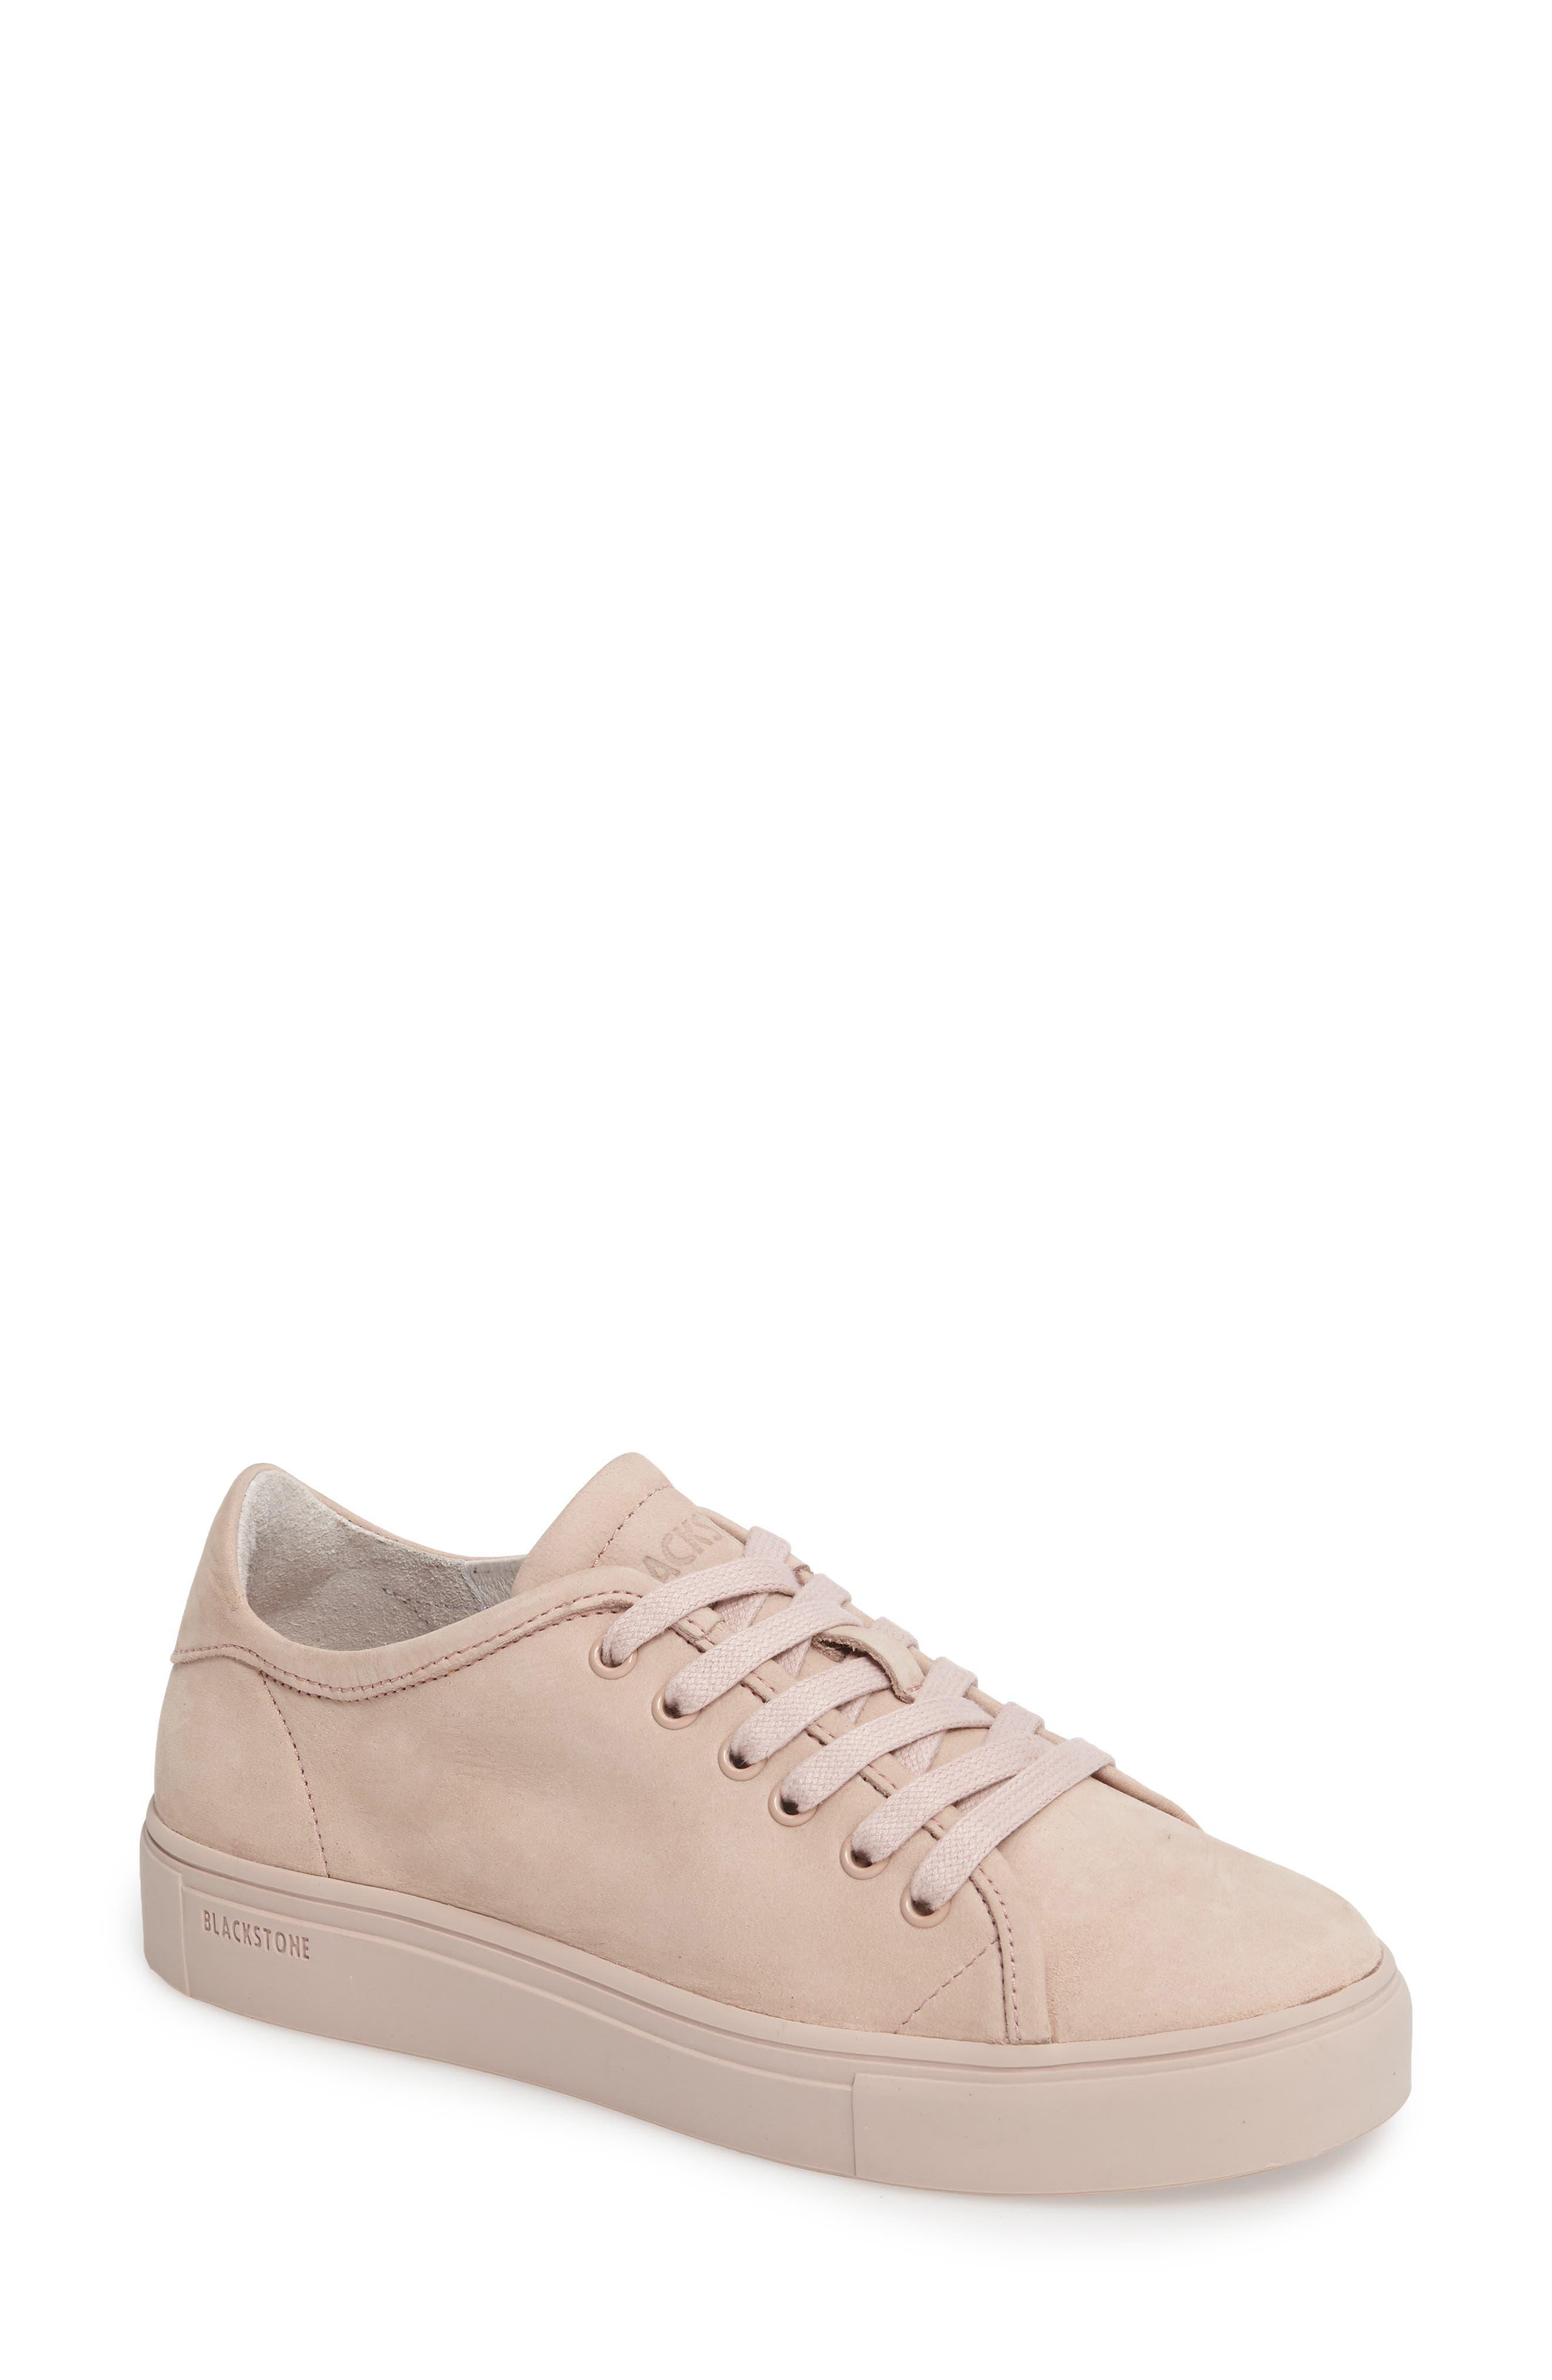 NL33 Sneaker,                             Main thumbnail 1, color,                             Dusty Rose Nubuck